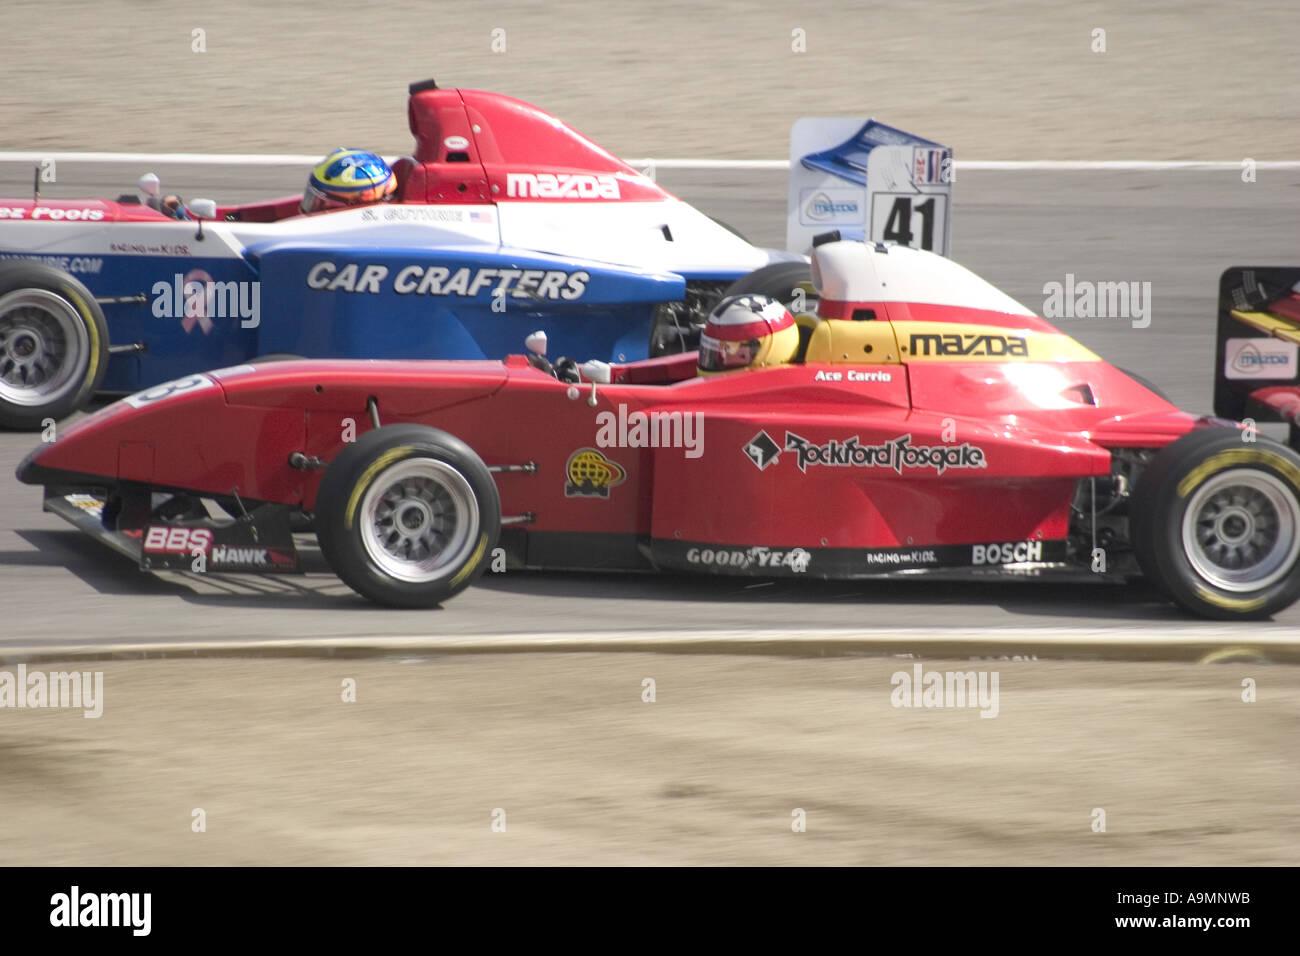 Star Mazda Race Cars on Track at Laguna Seca Adrian Carrio Driver ...